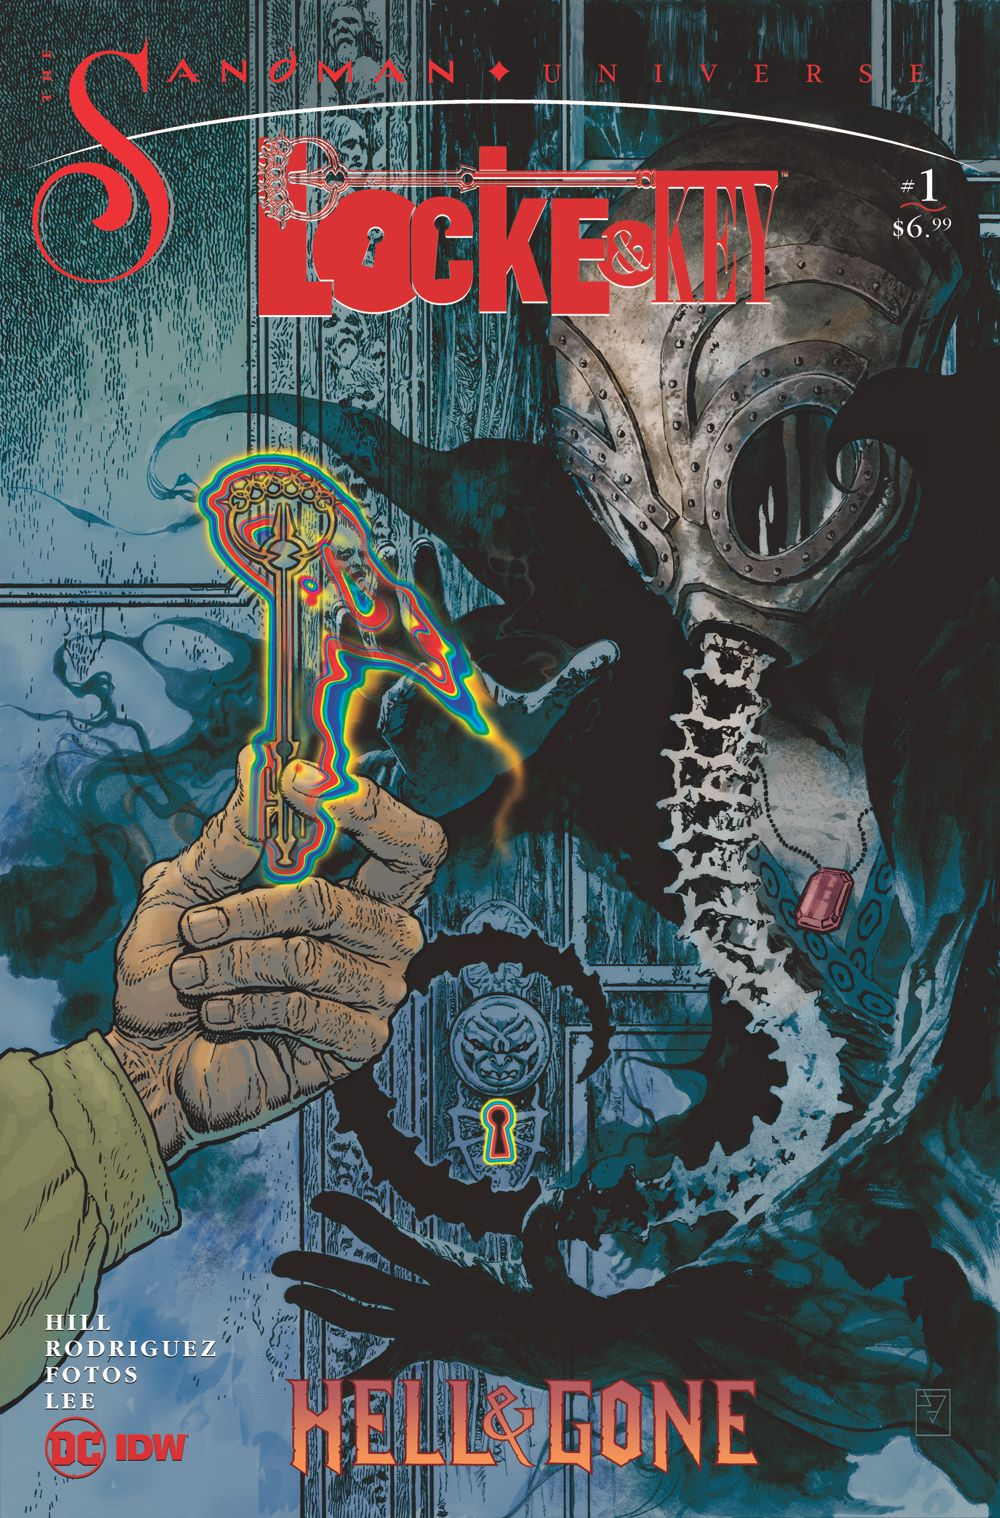 LnK-Sandma-2 ComicList Previews: LOCKE AND KEY THE SANDMAN UNIVERSE HELL AND GONE #1